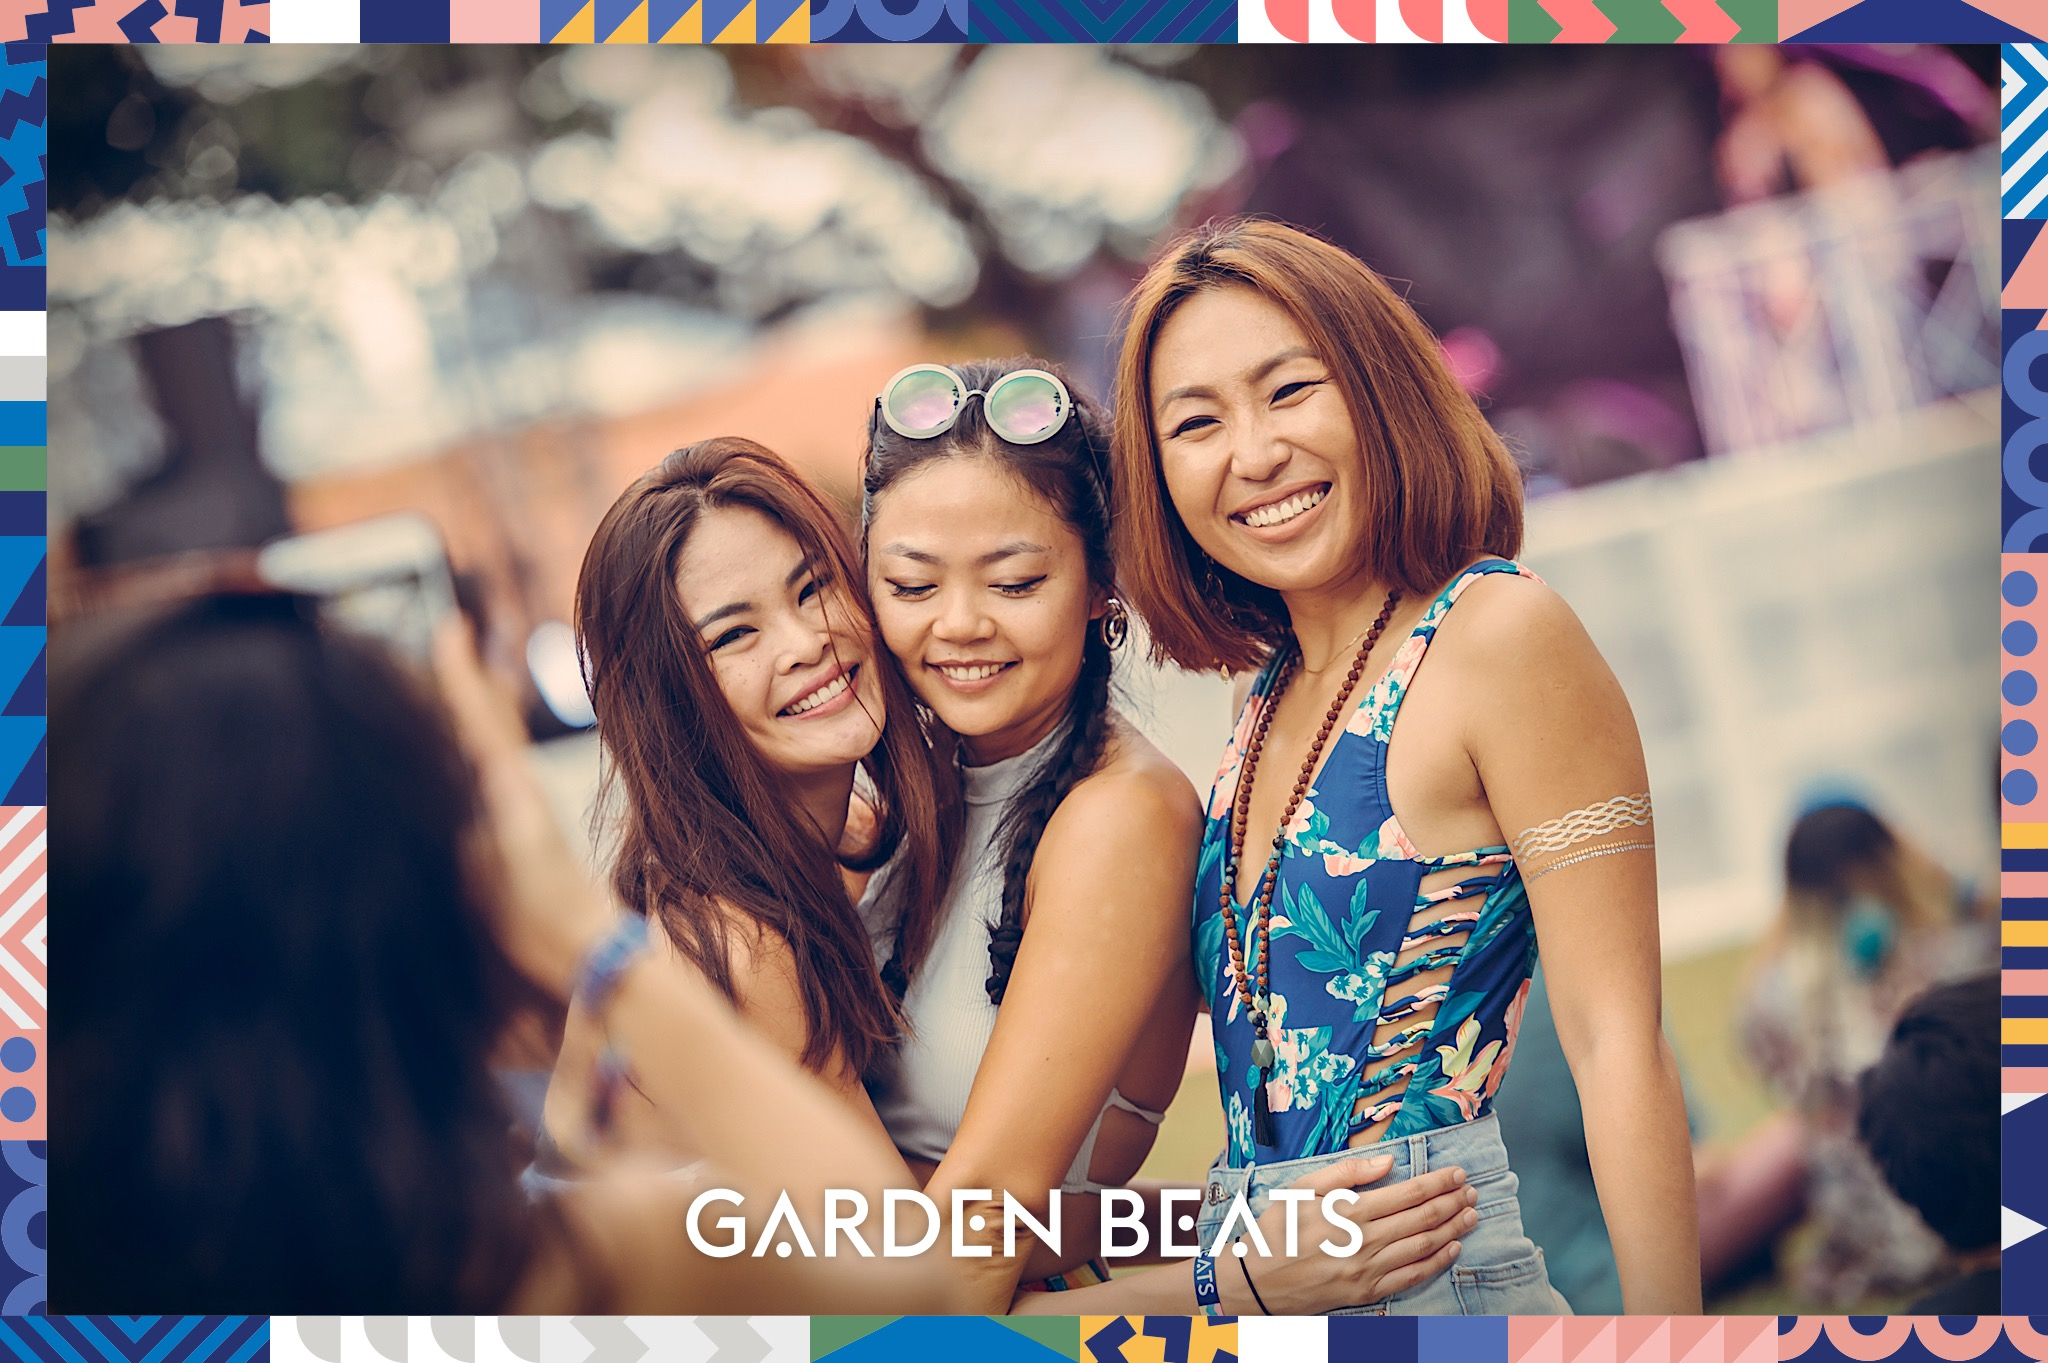 03032018_GardenBeats_Colossal428_Watermarked.jpg